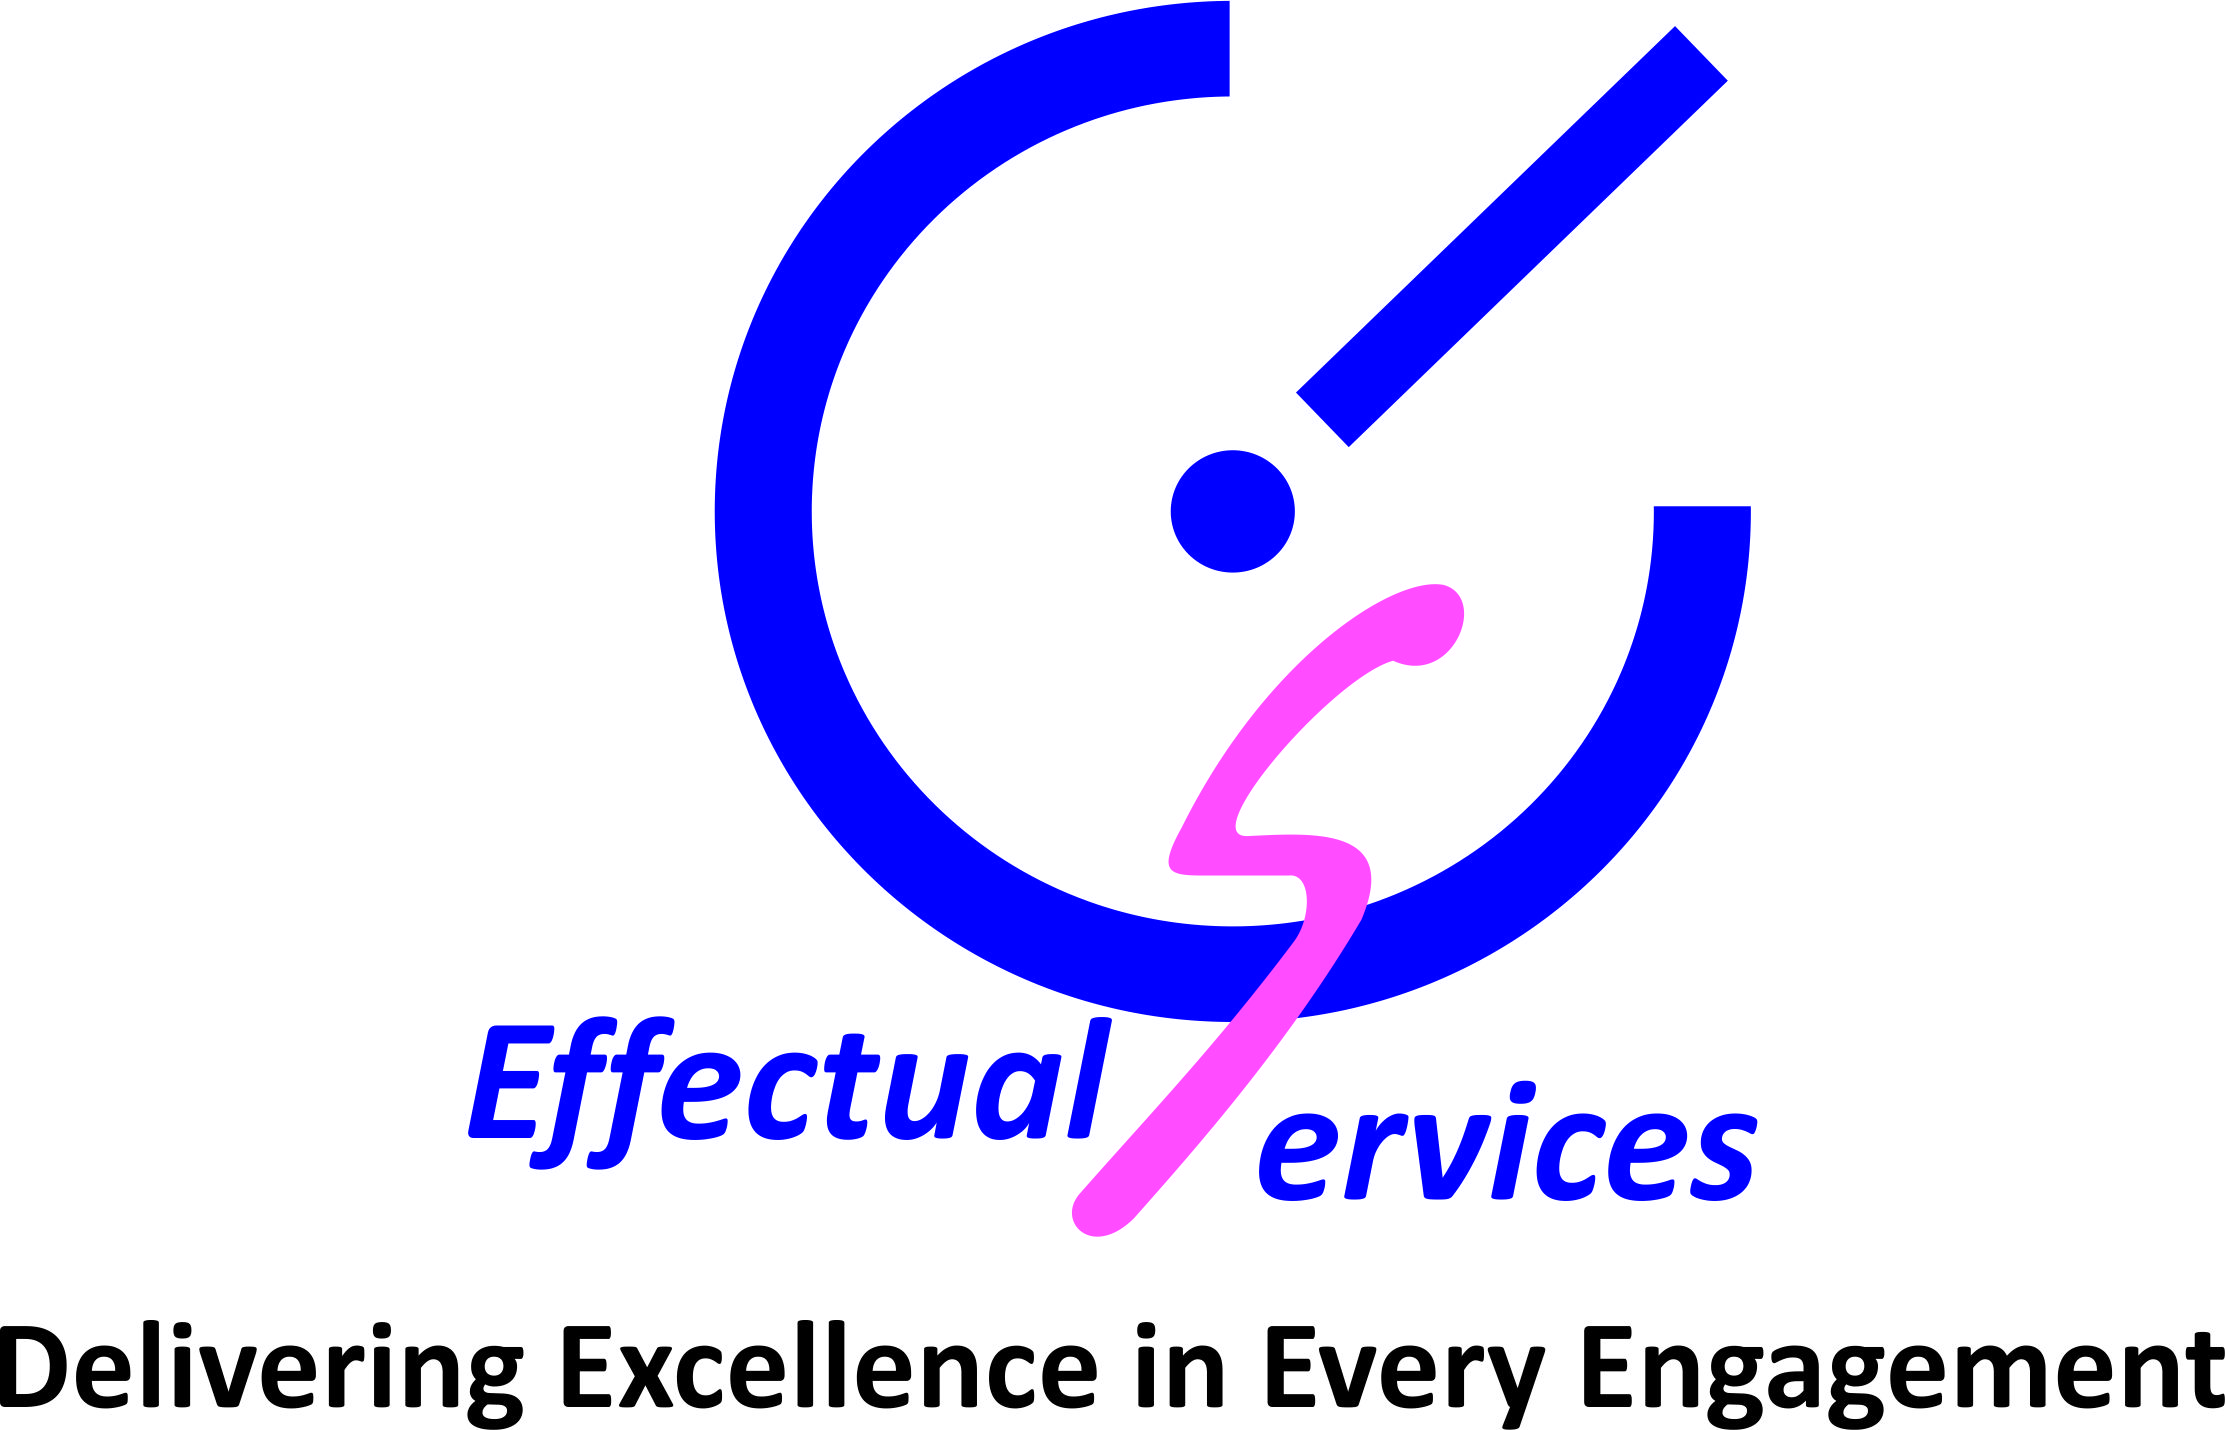 Effectual Knowledge Services Pvt Ltd